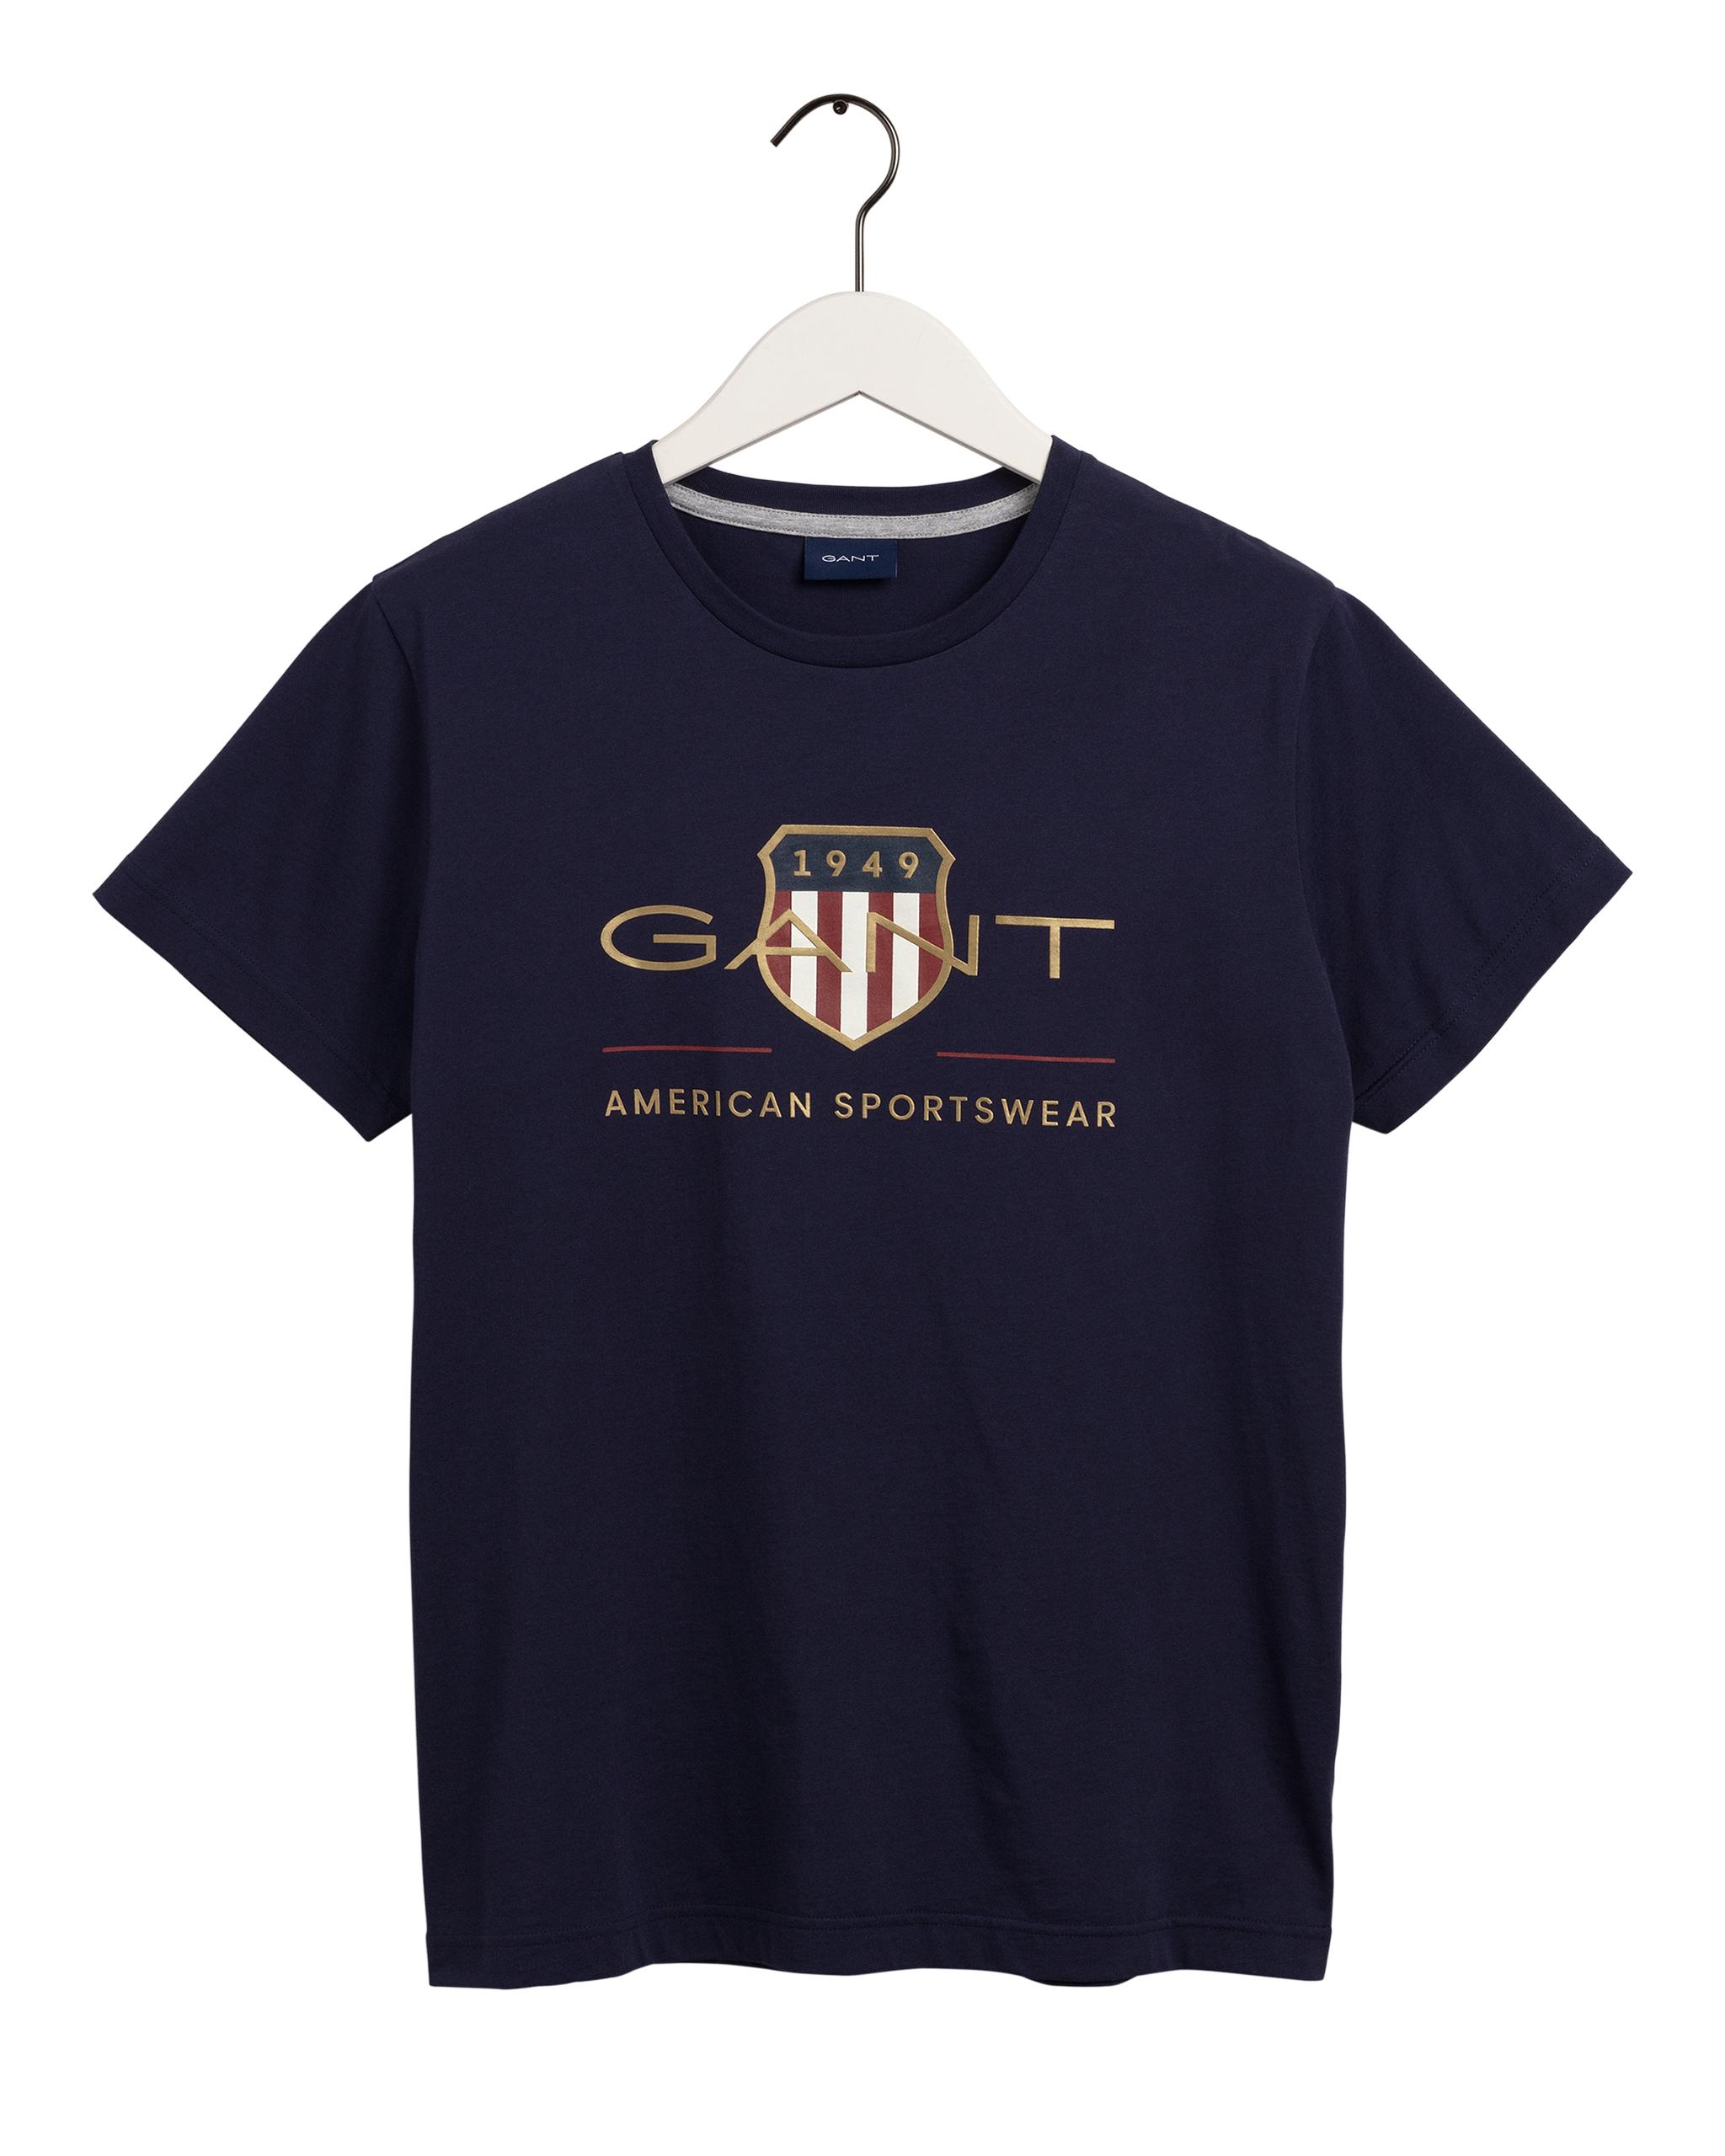 Gant Archive Shield t-shirt, evening blue, small